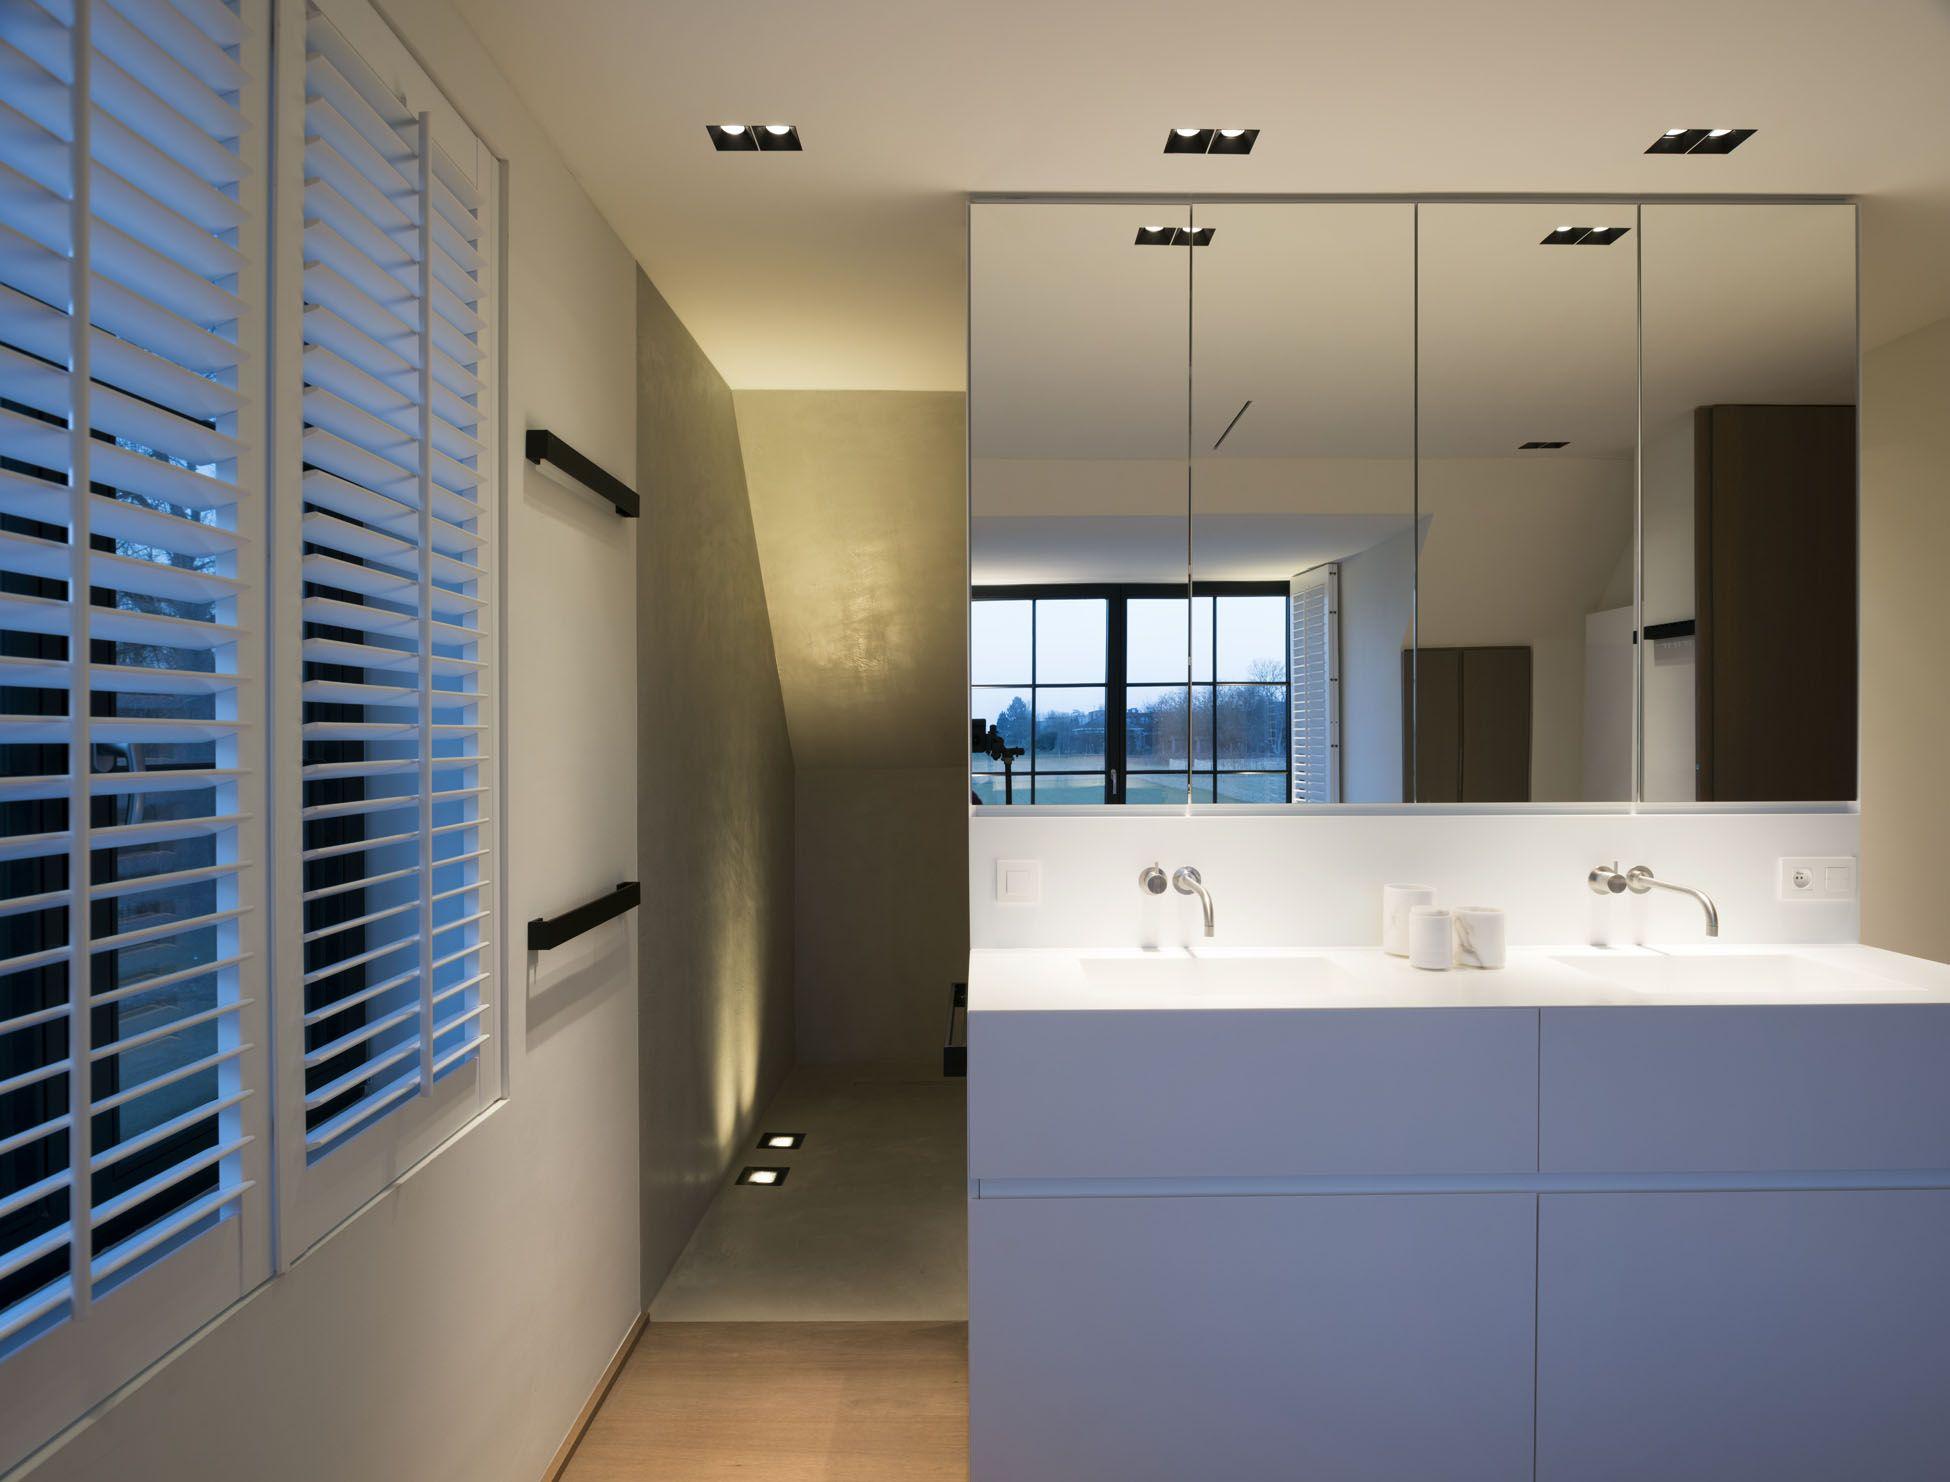 bathrooms lighting. Kreon Lighting Minimalist Modern LED Design Architecture White Bathroom Walk In Shower Mirror Uplight Up Downlight Spotlight Recessed Sink Basin Bathrooms A